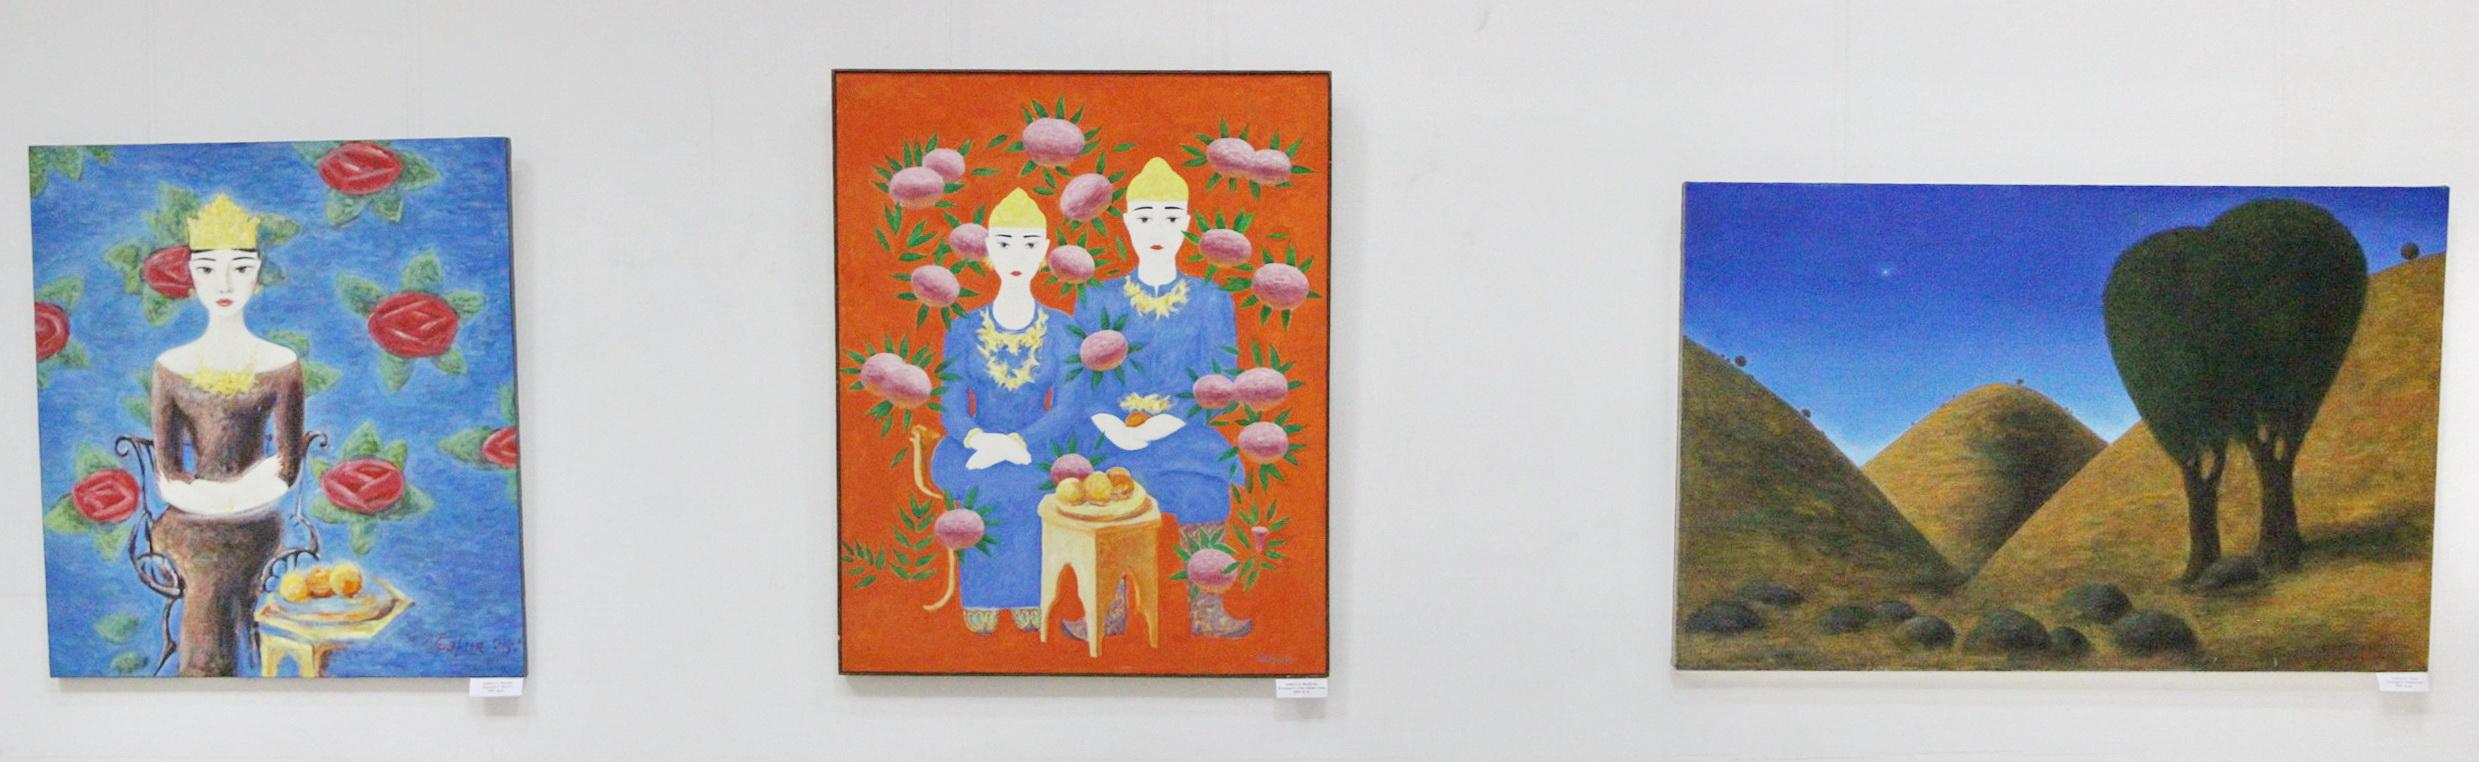 Экспозиция картин Гафура Кадырова